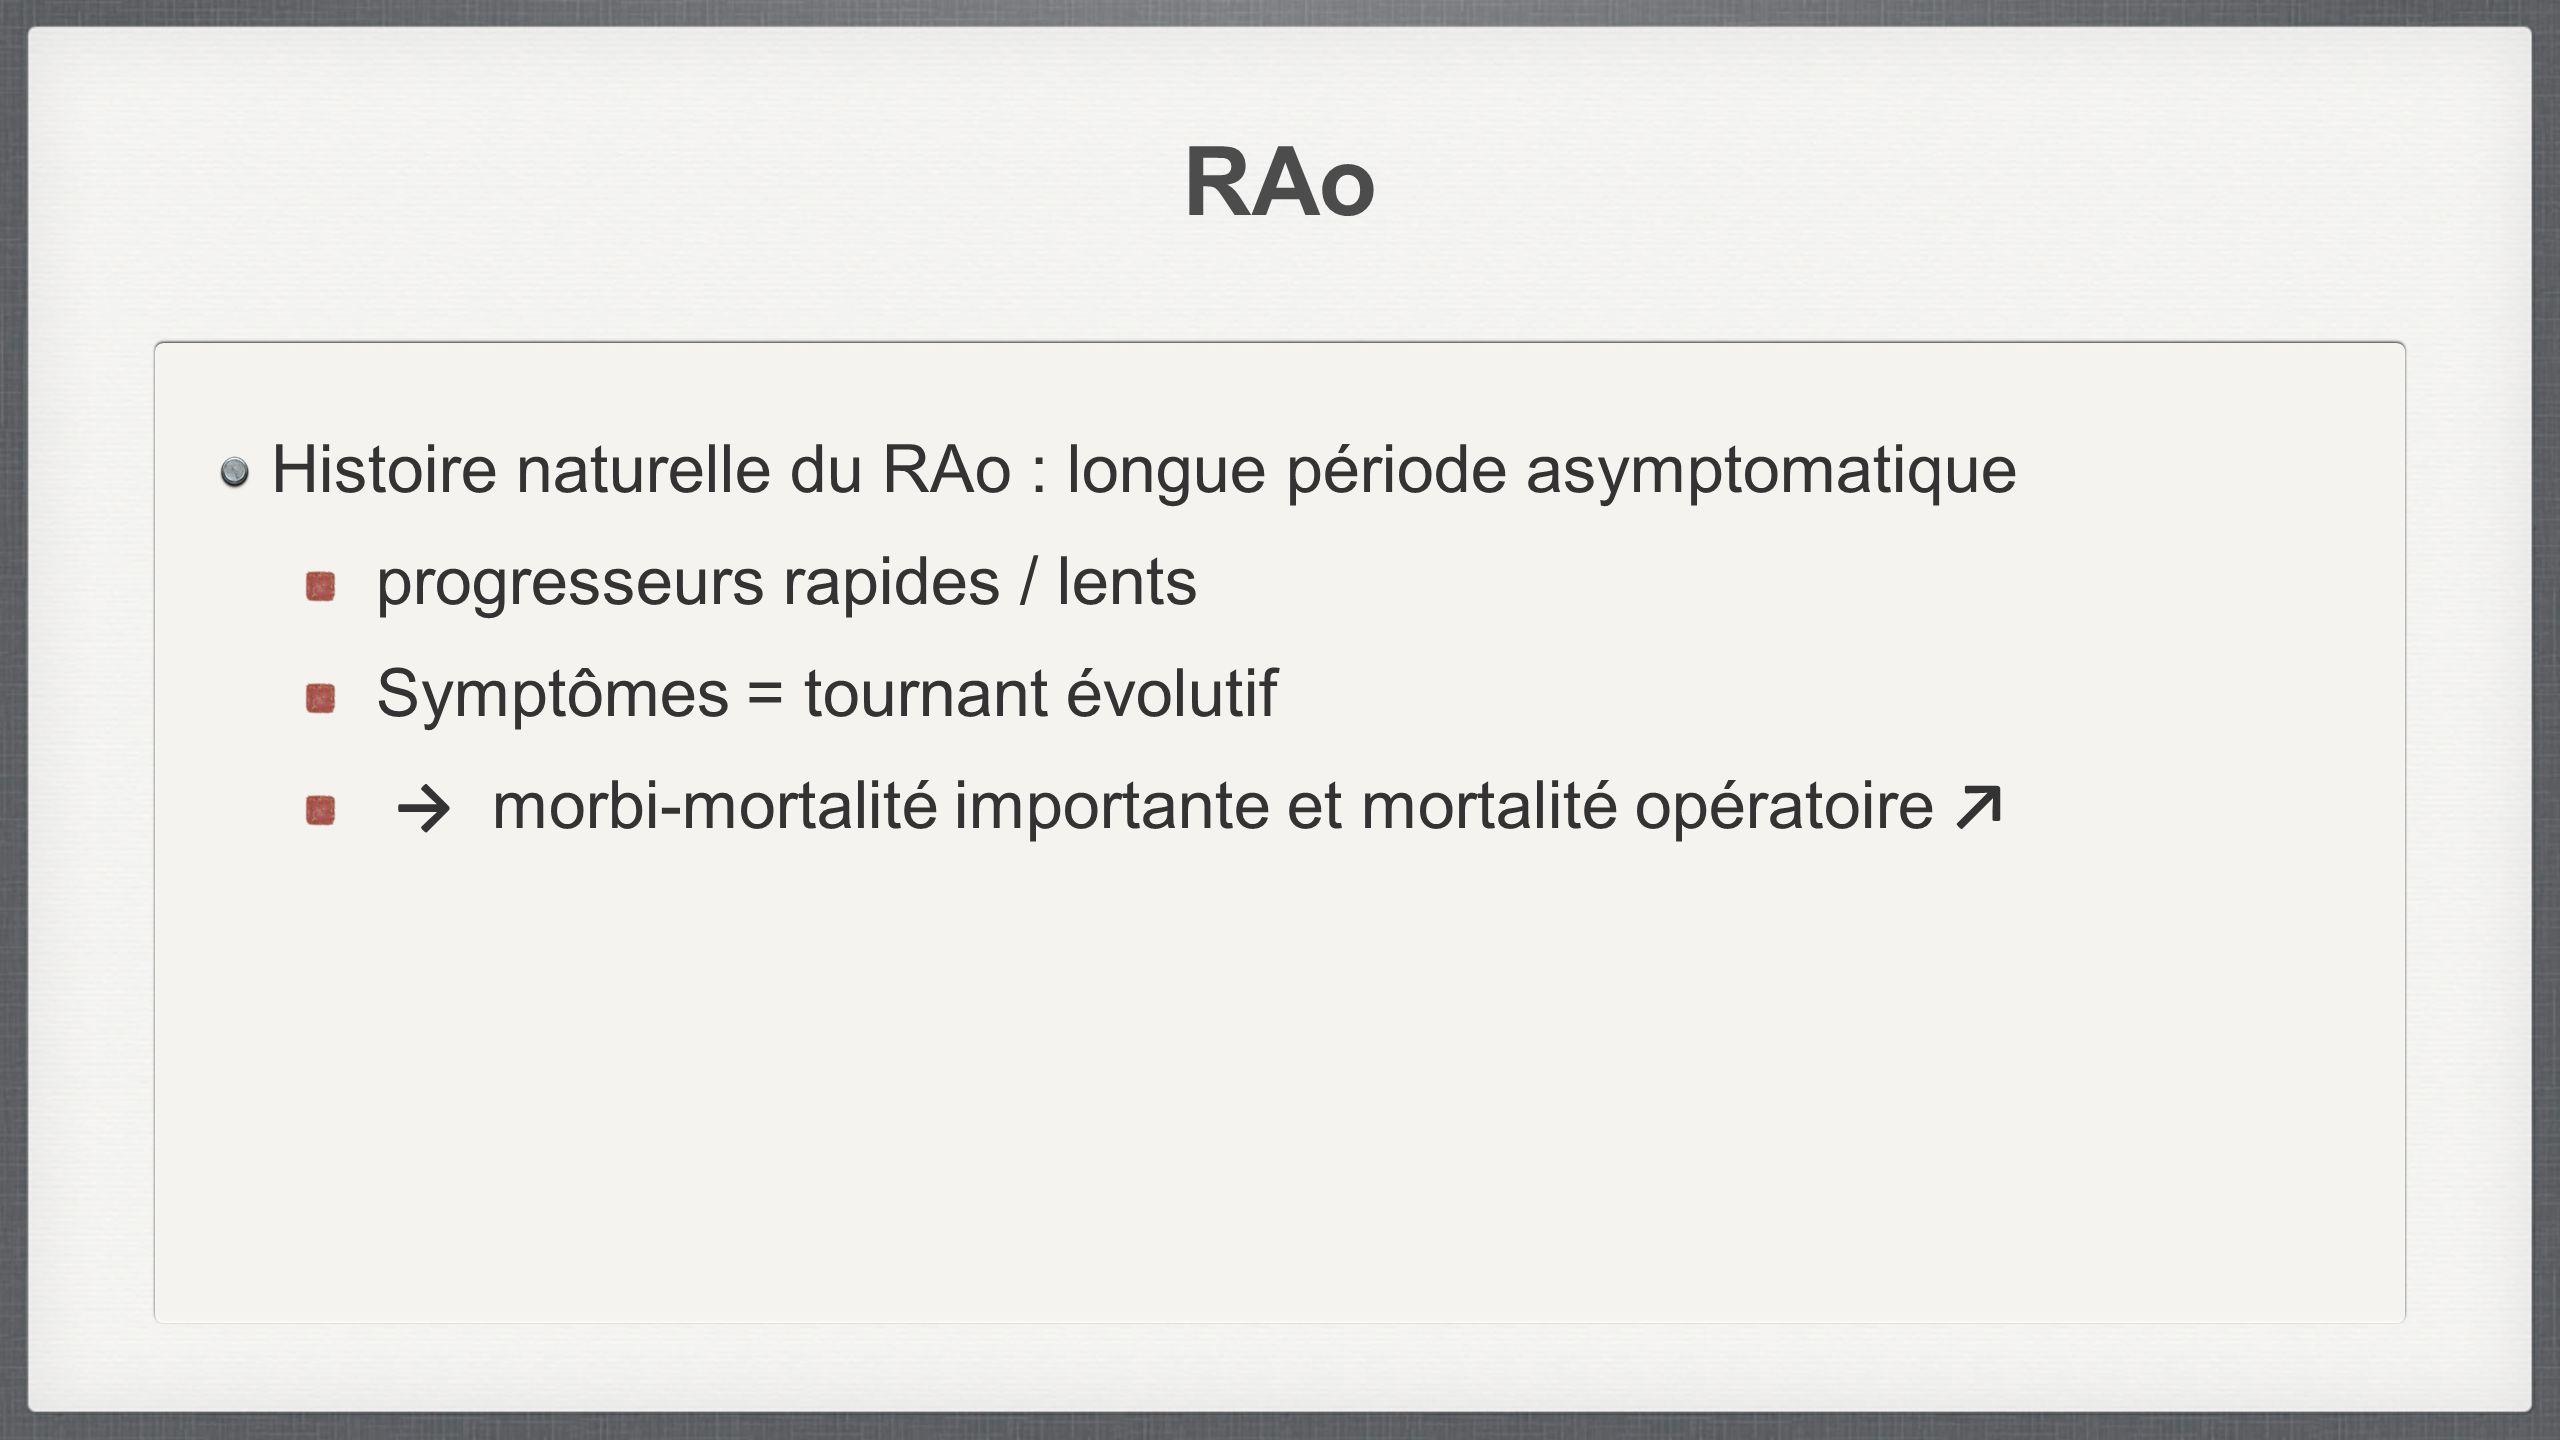 RAo Histoire naturelle du RAo : longue période asymptomatique